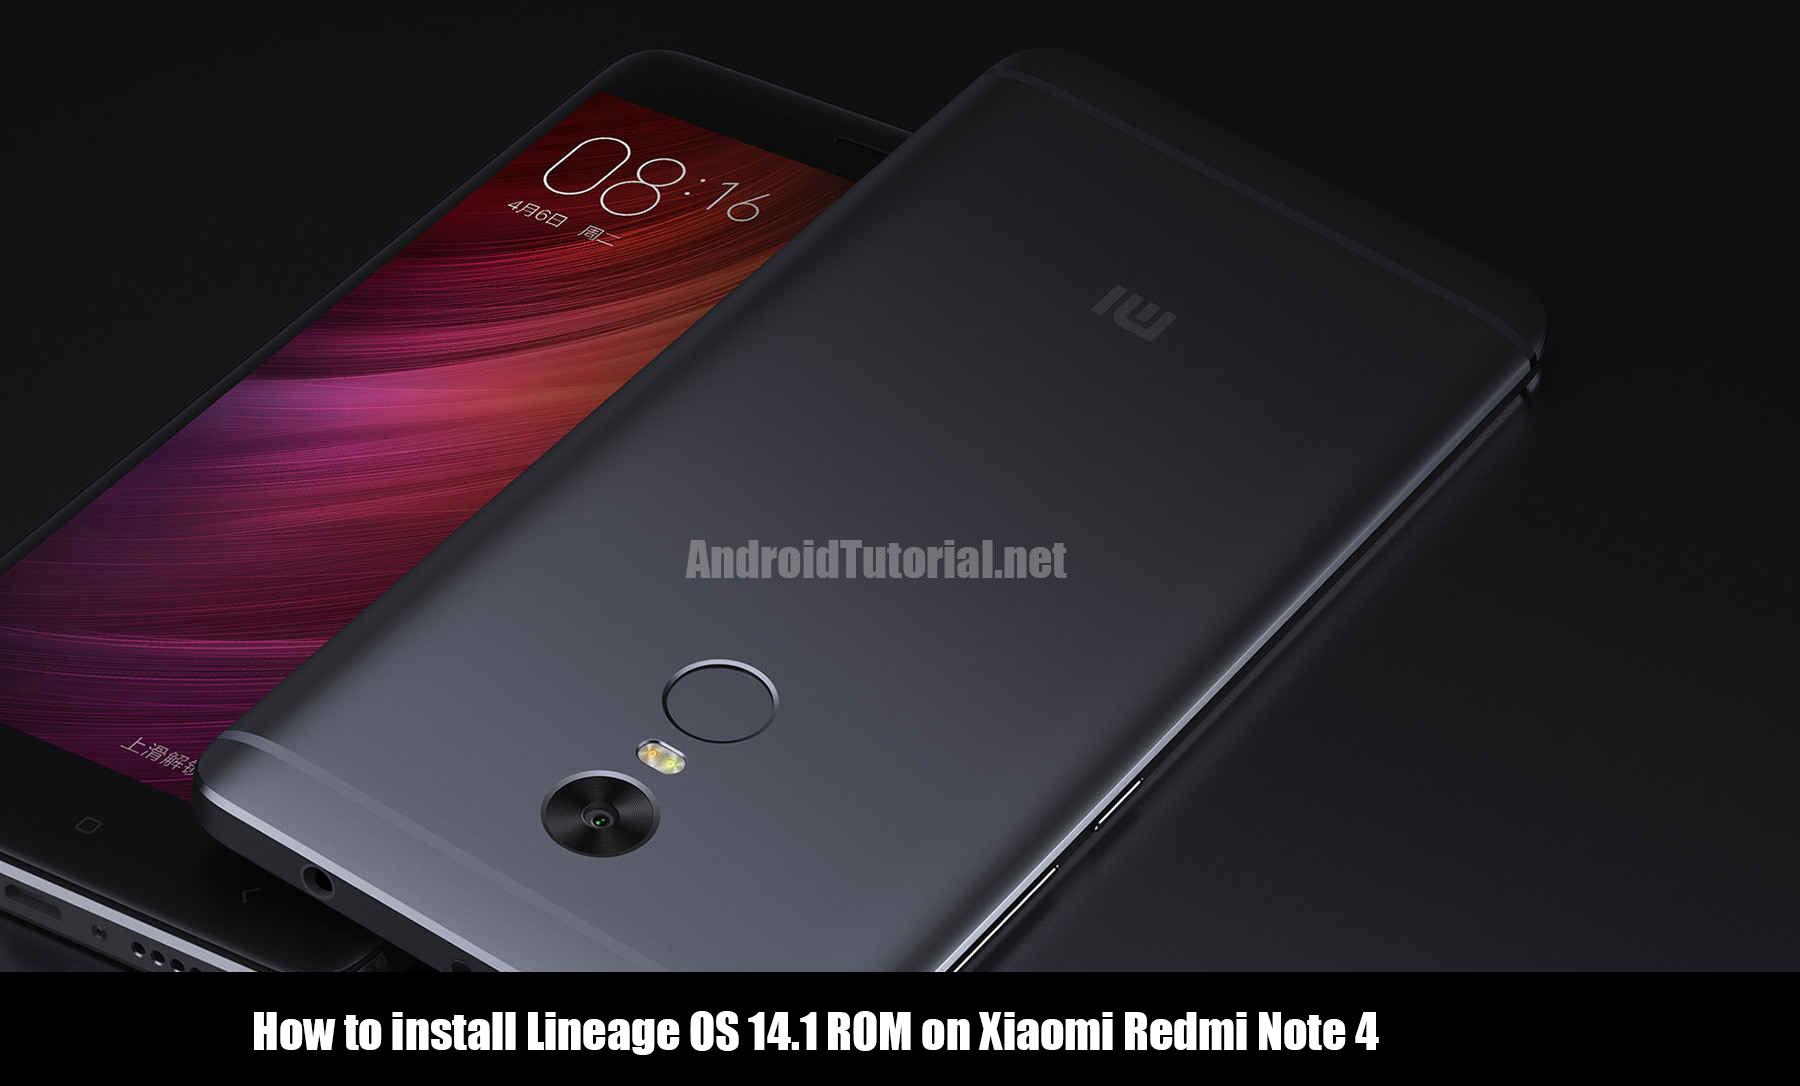 Tema Xiaomi Redmi Nota 4 2017 Para Android: How To Install Lineage OS 14.1 ROM On Xiaomi Redmi Note 4